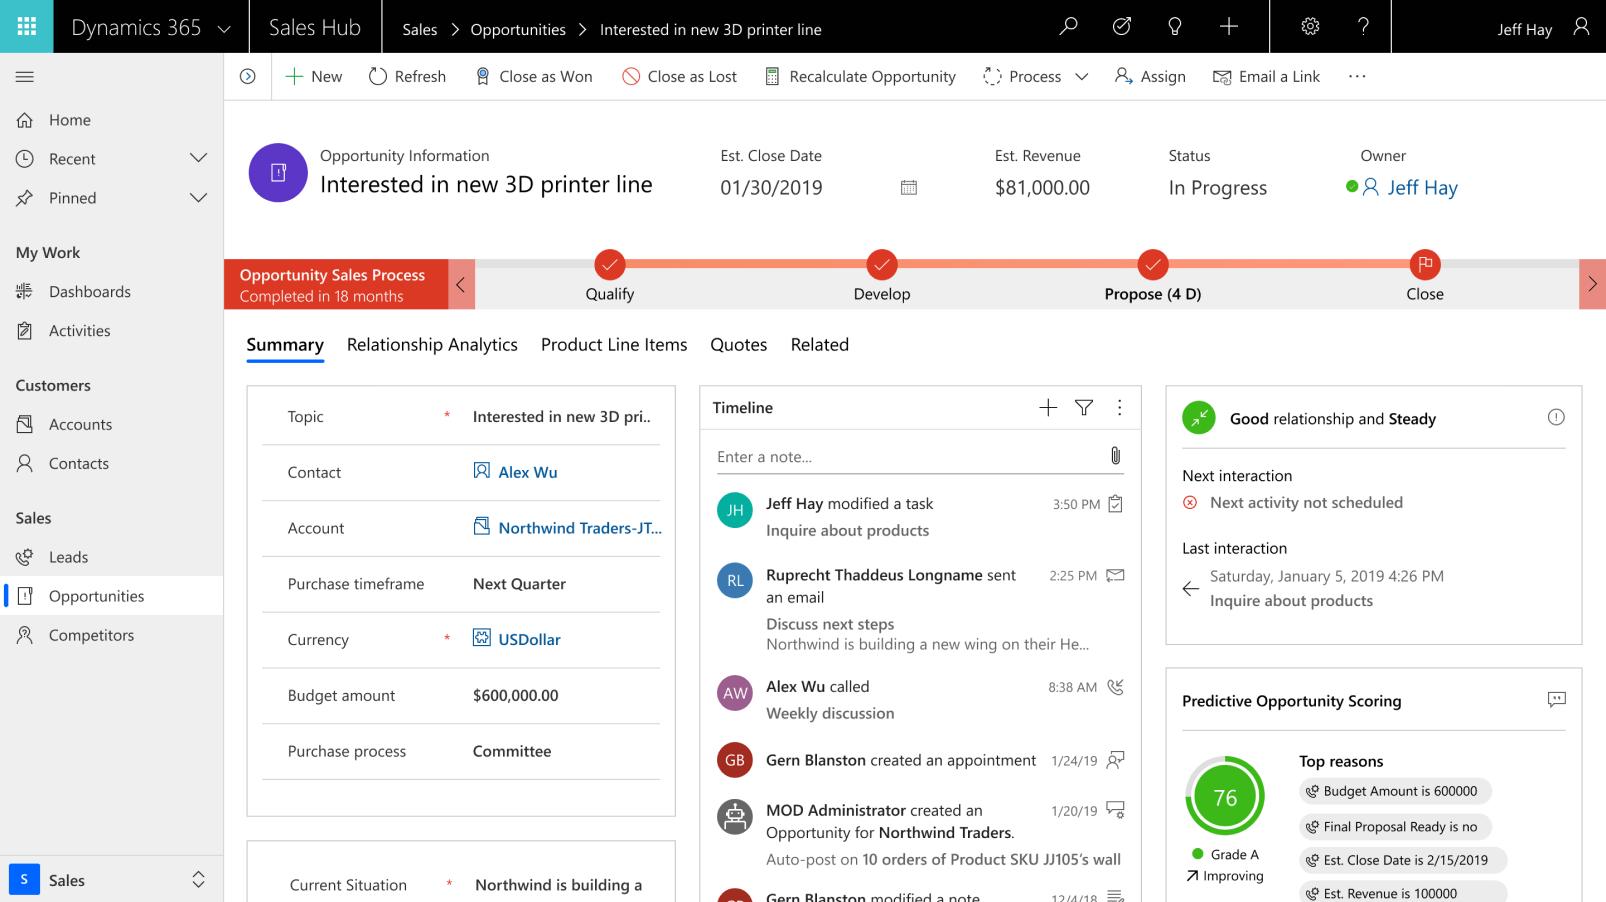 Dynamics 365 screenshot: Microsoft Dynamics 365 sales opportunity tracking